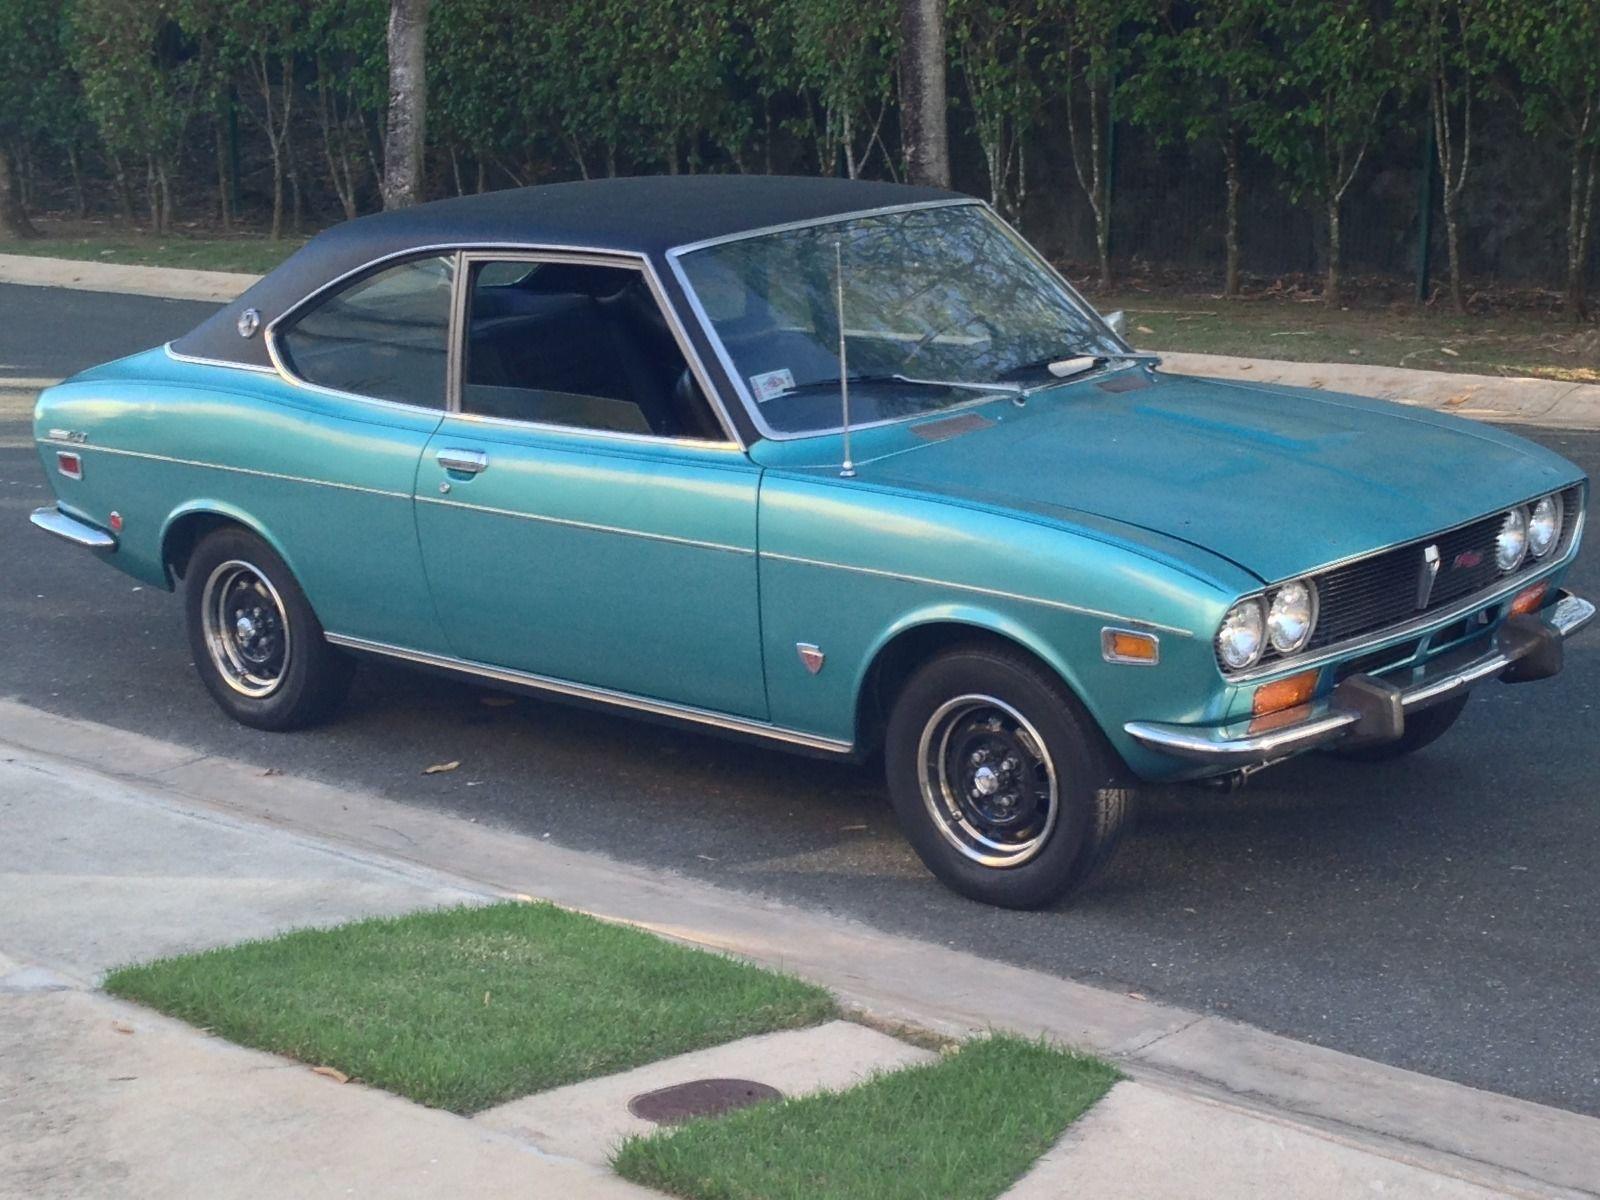 Details about 1971 Mazda RX-2 | mazda rx2 | Mazda, Jdm cars, Classic